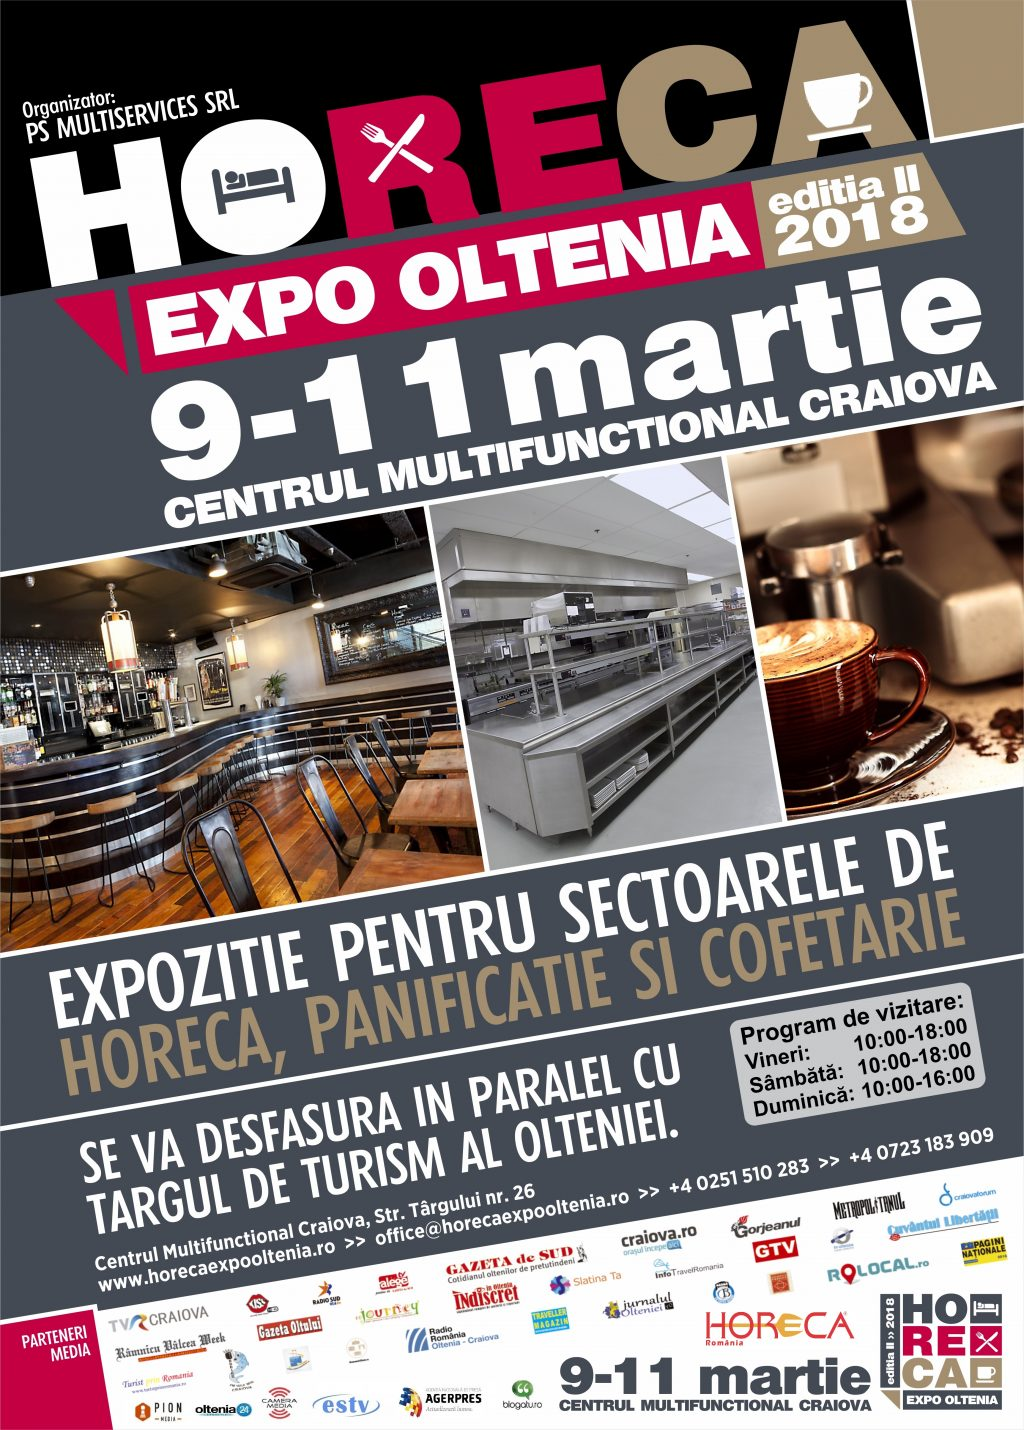 HoReCa EXPO Oltenia ed. a II-a – cel mai mare eveniment dedicat industriei horeca din Oltenia se va desfasuara in perioada 9-11 martie la Craiova